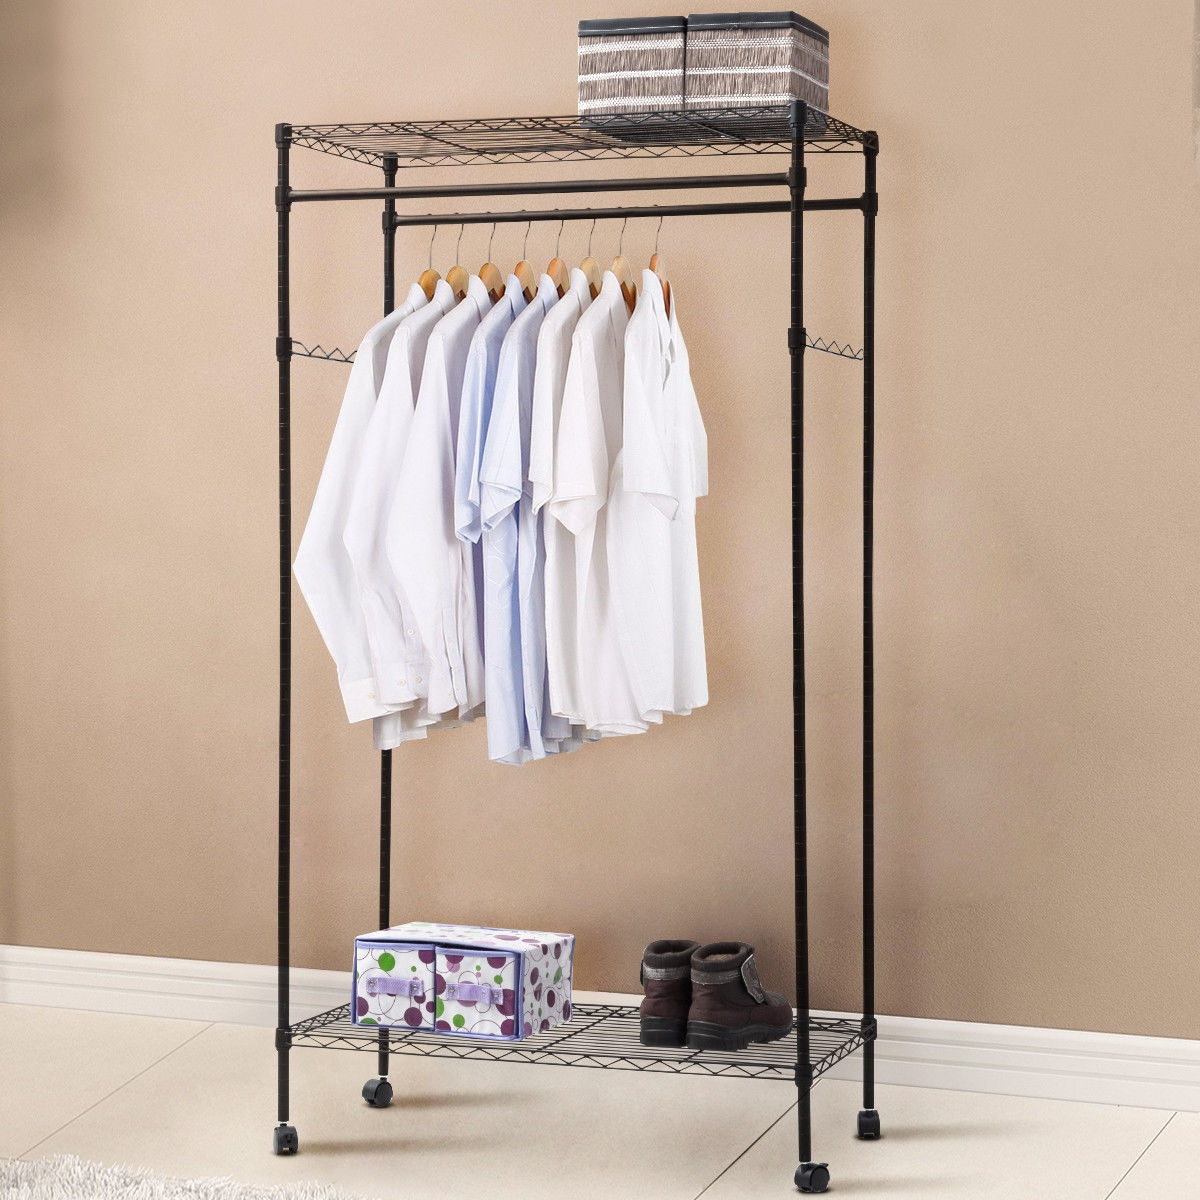 Double Hanging Rolling Adjustable Rod Portable Garment Rack